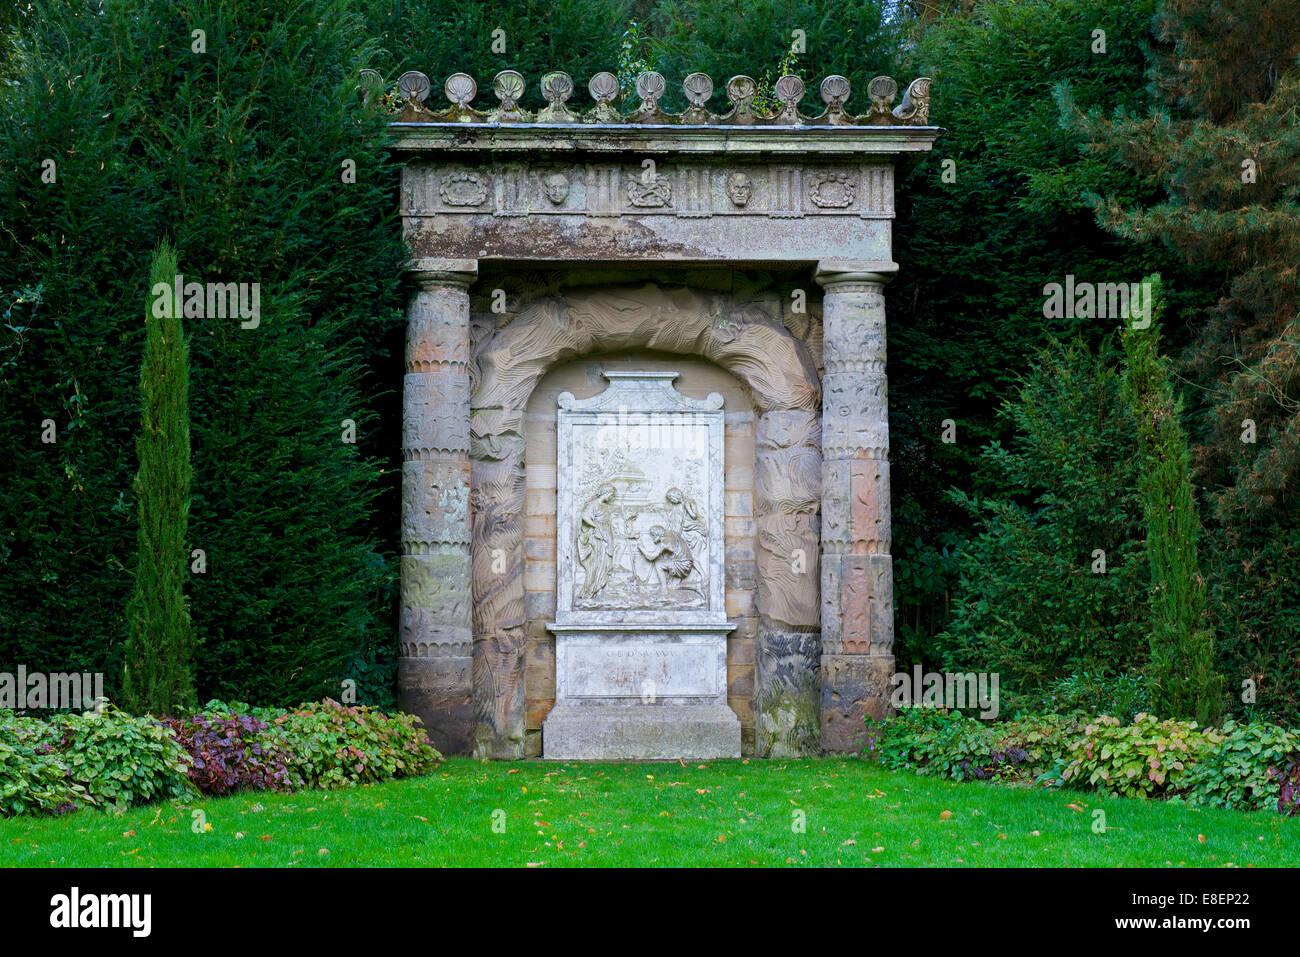 The gardens at Shugborough Hall, Staffordshire, England UK - Stock Image